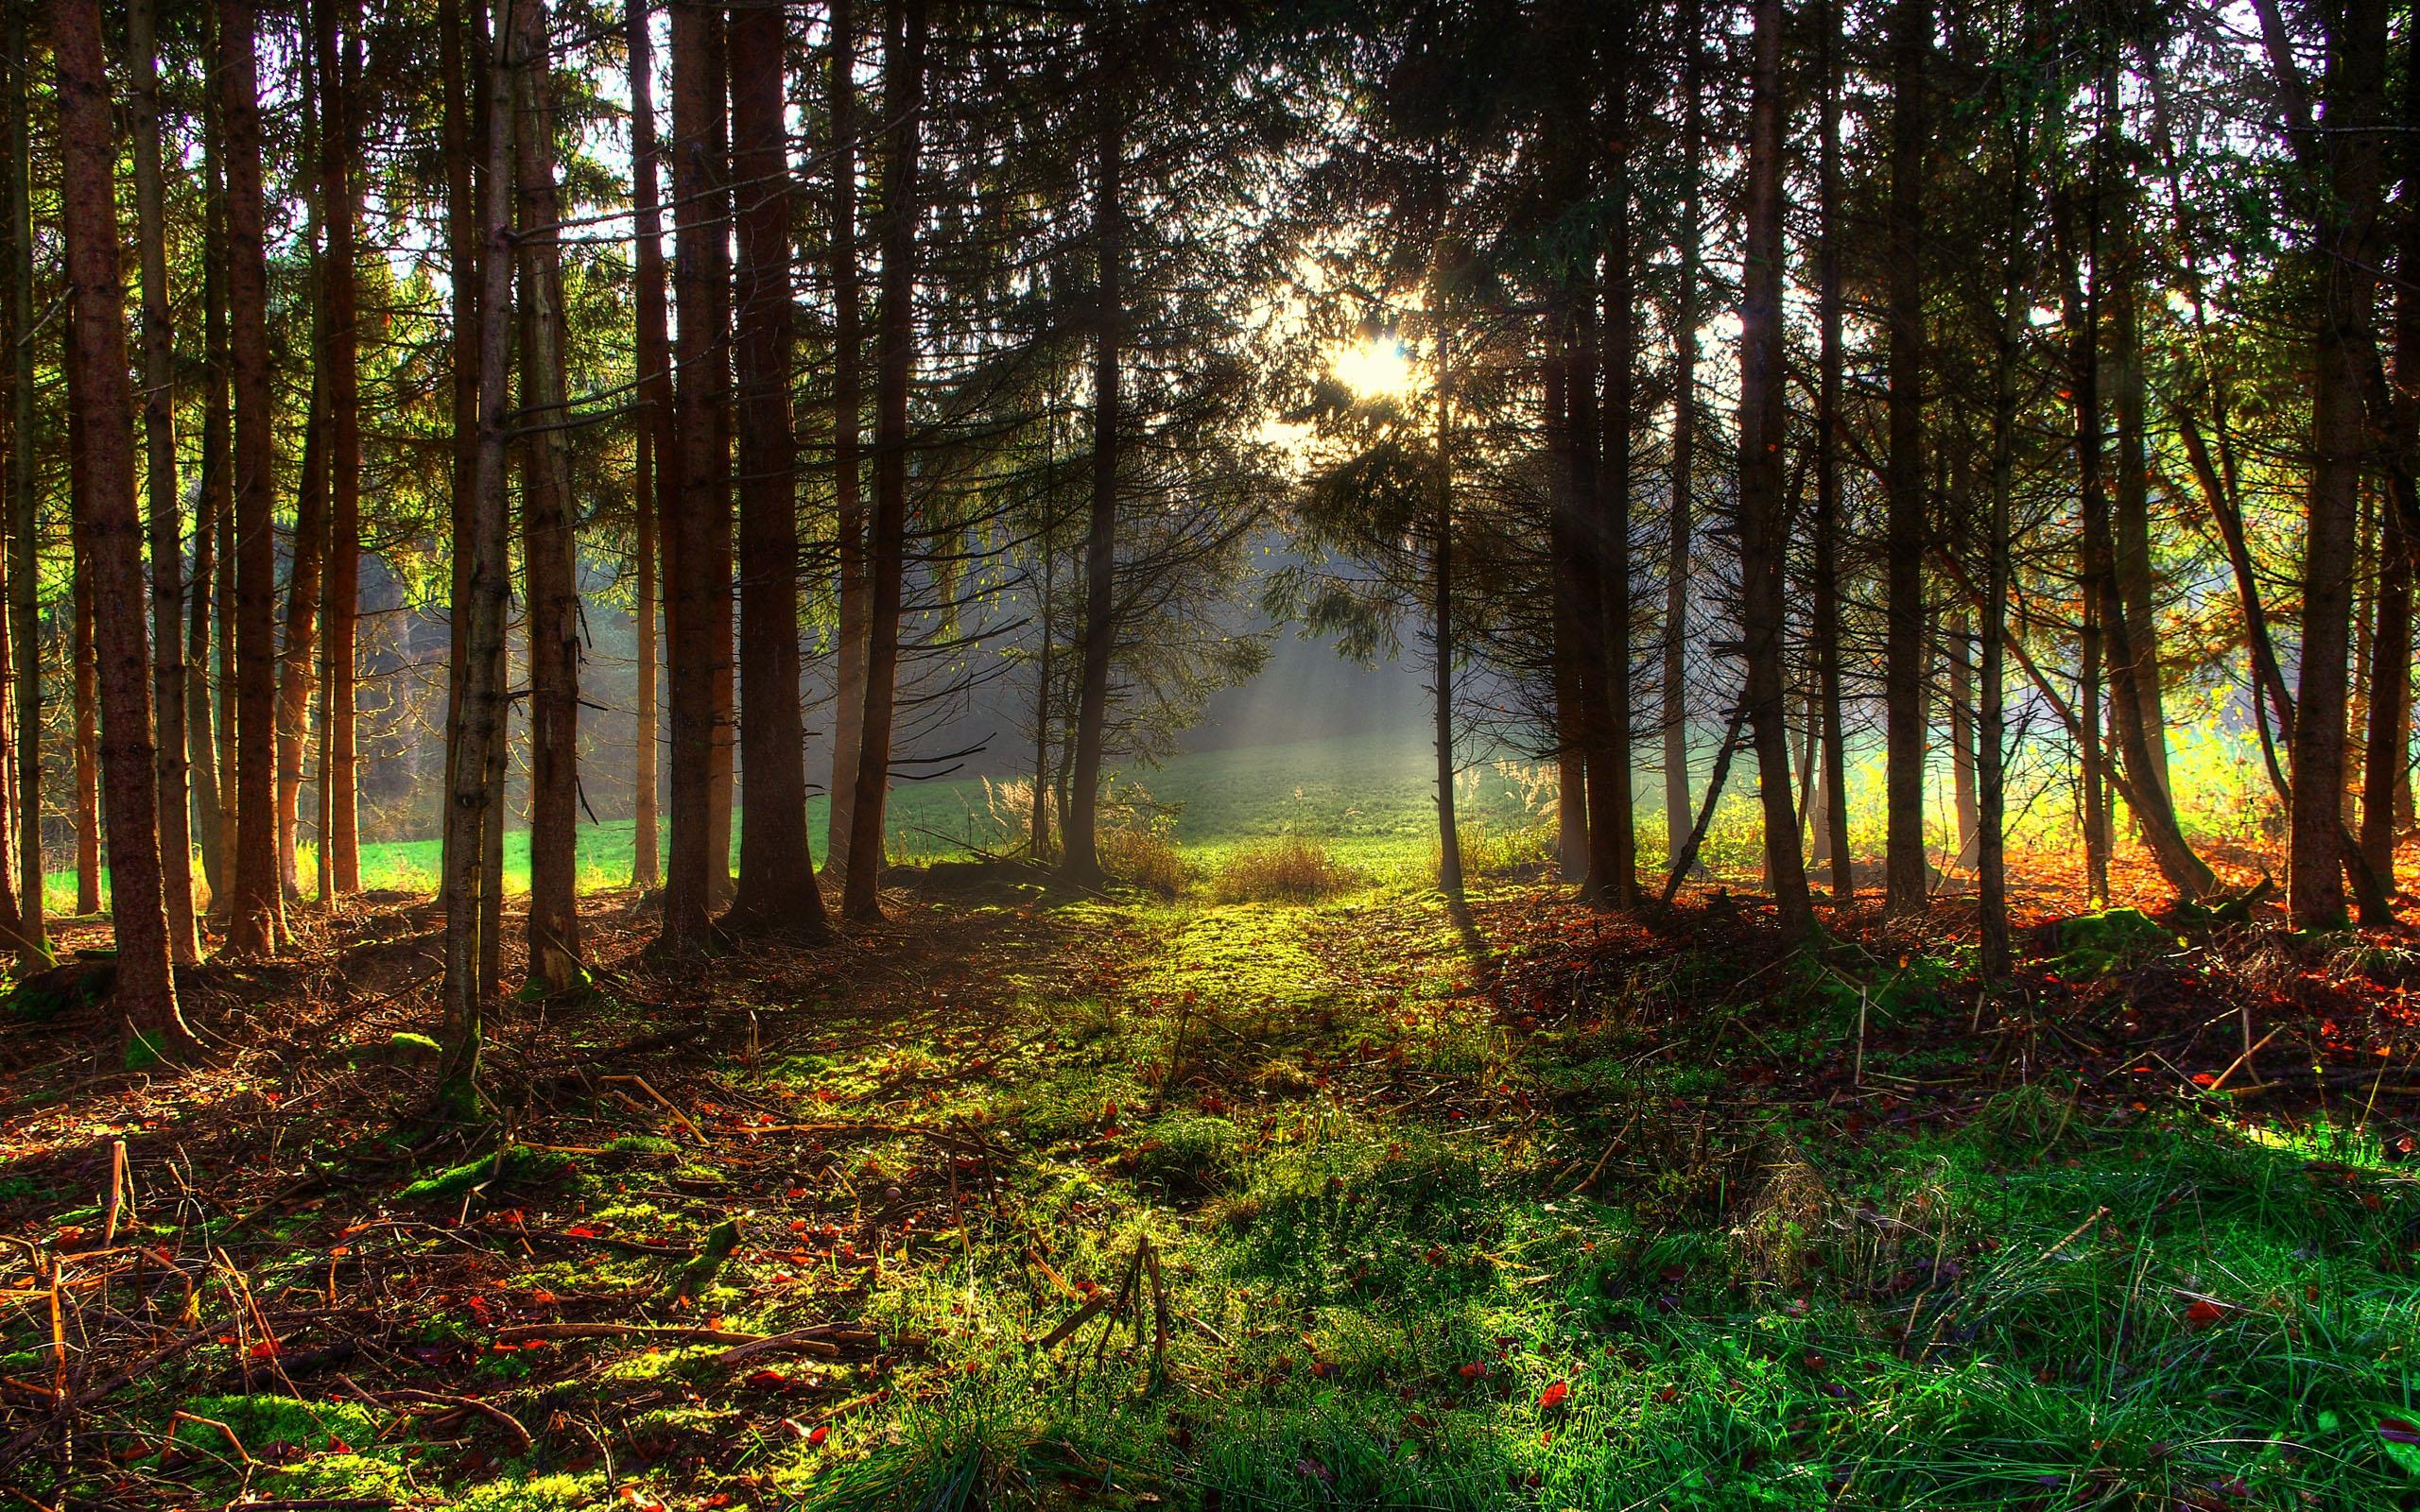 821816-gorgeous-spring-forest-wallpaper.jpg HTML code